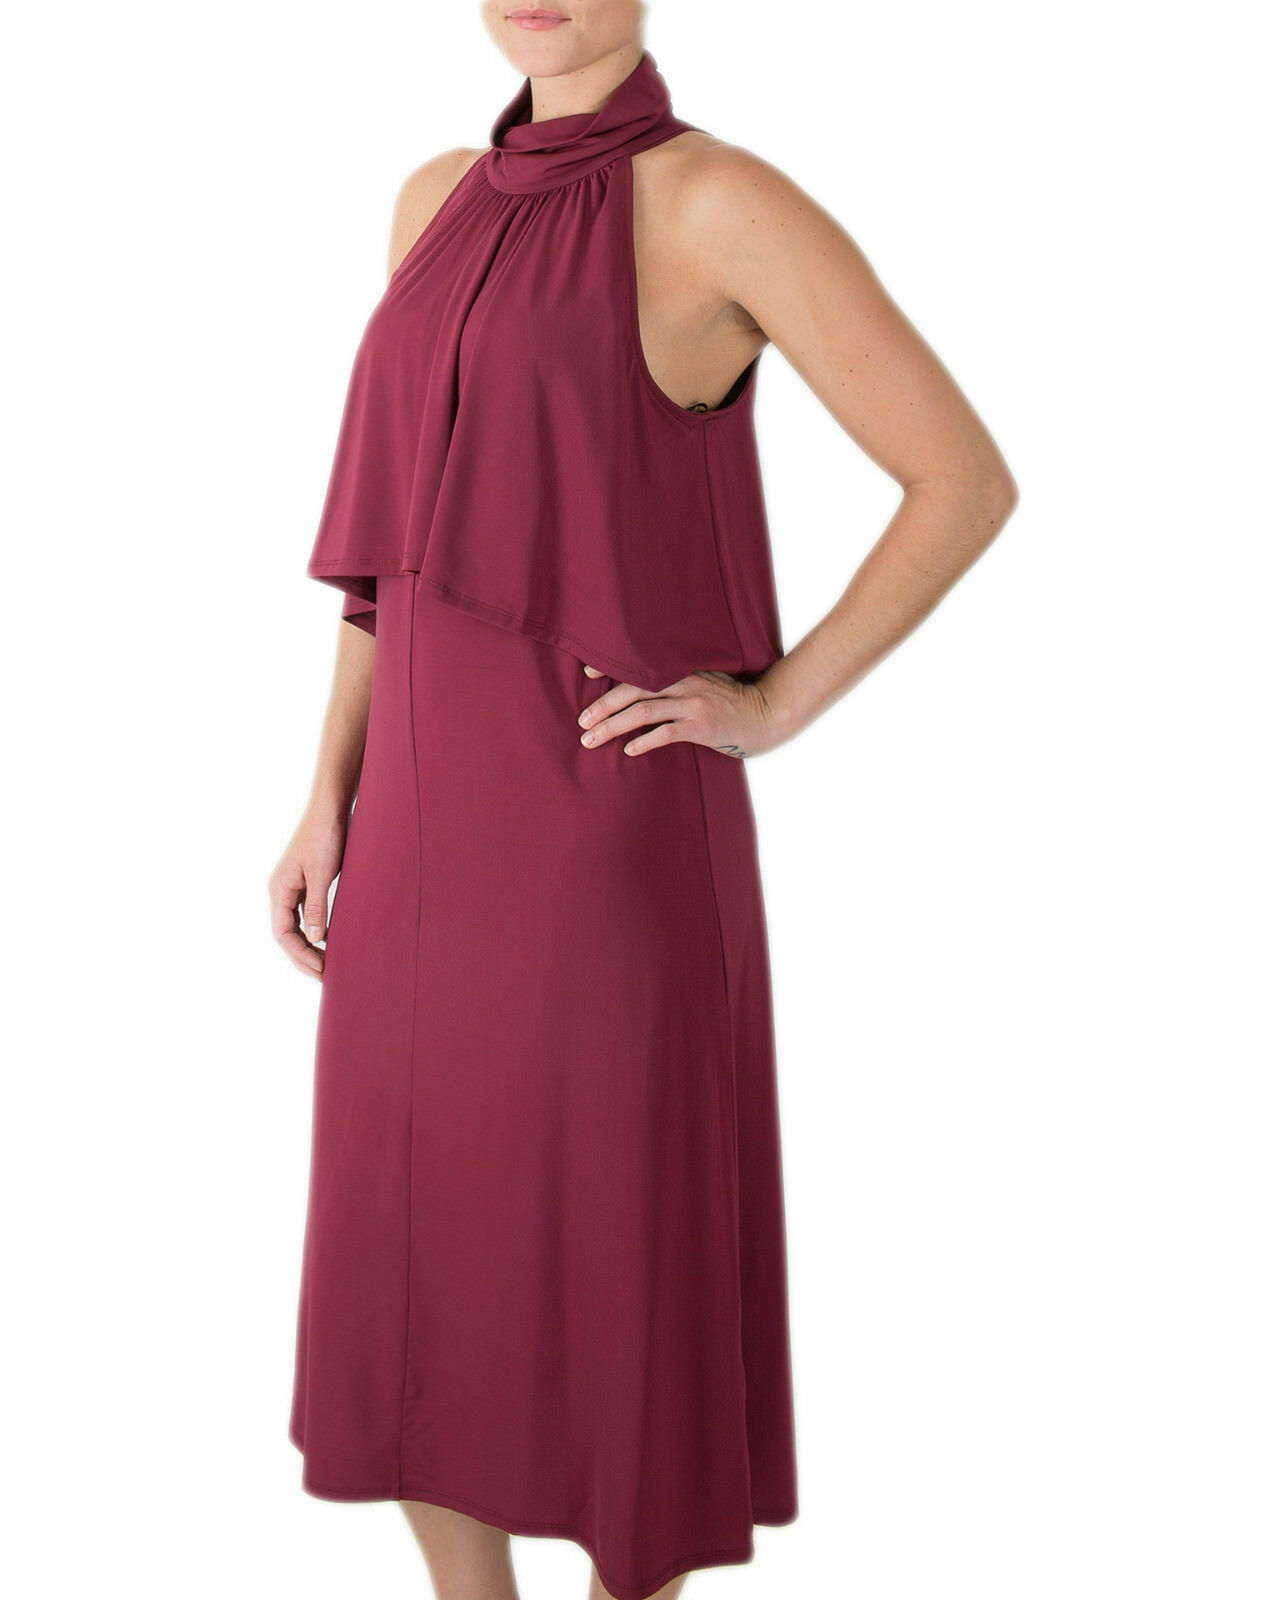 NWT Ella Moss Designer Elegant Aubriella Halter Port Red Midi Dress S